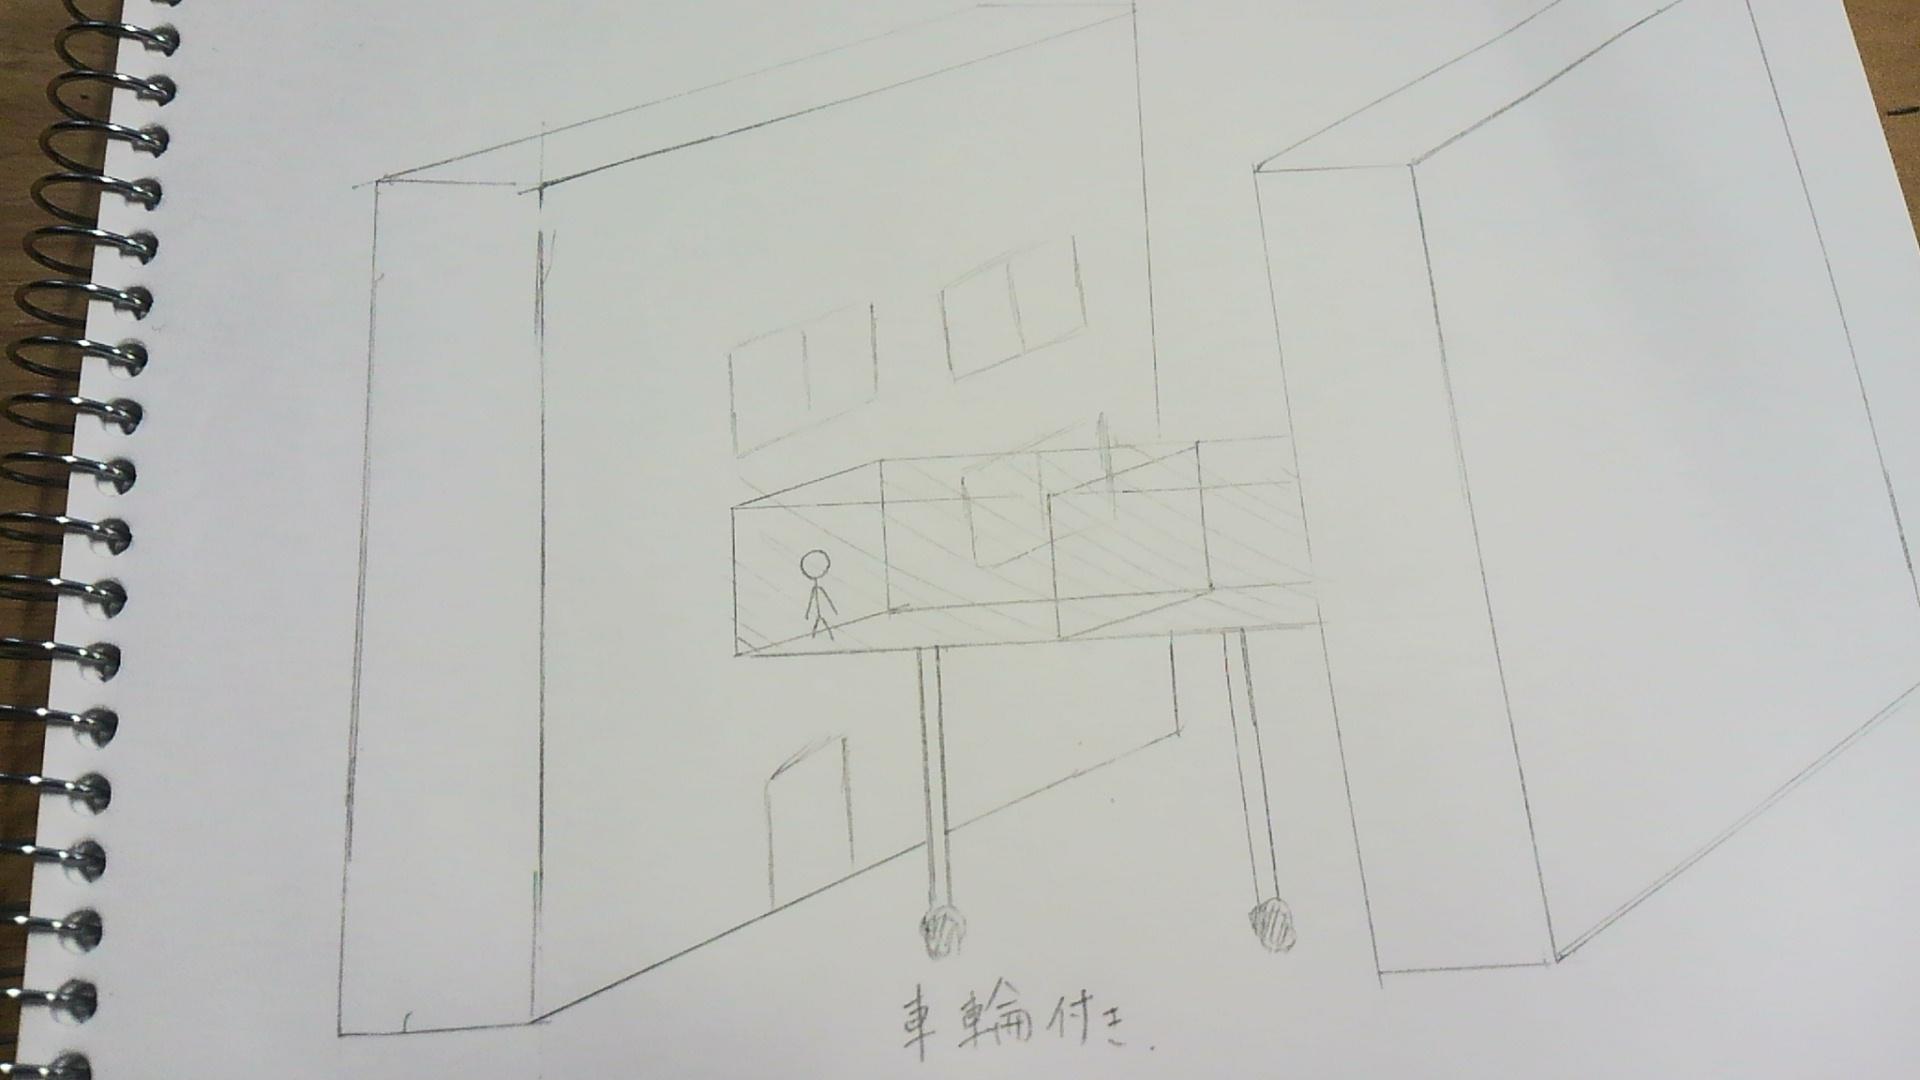 KIMG0189.JPG